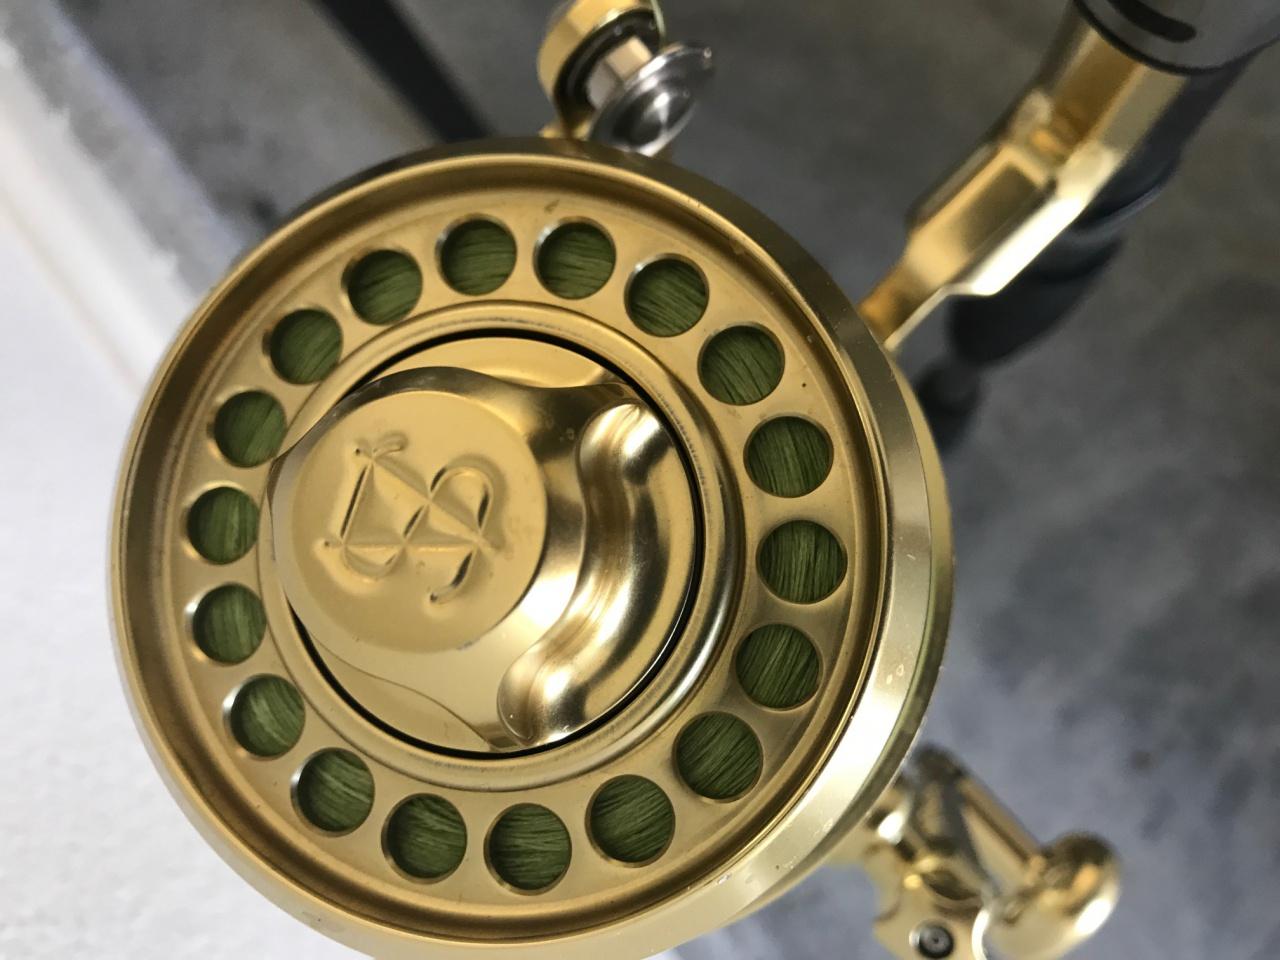 Inoxidable 300 De Oro shSNlin5B0